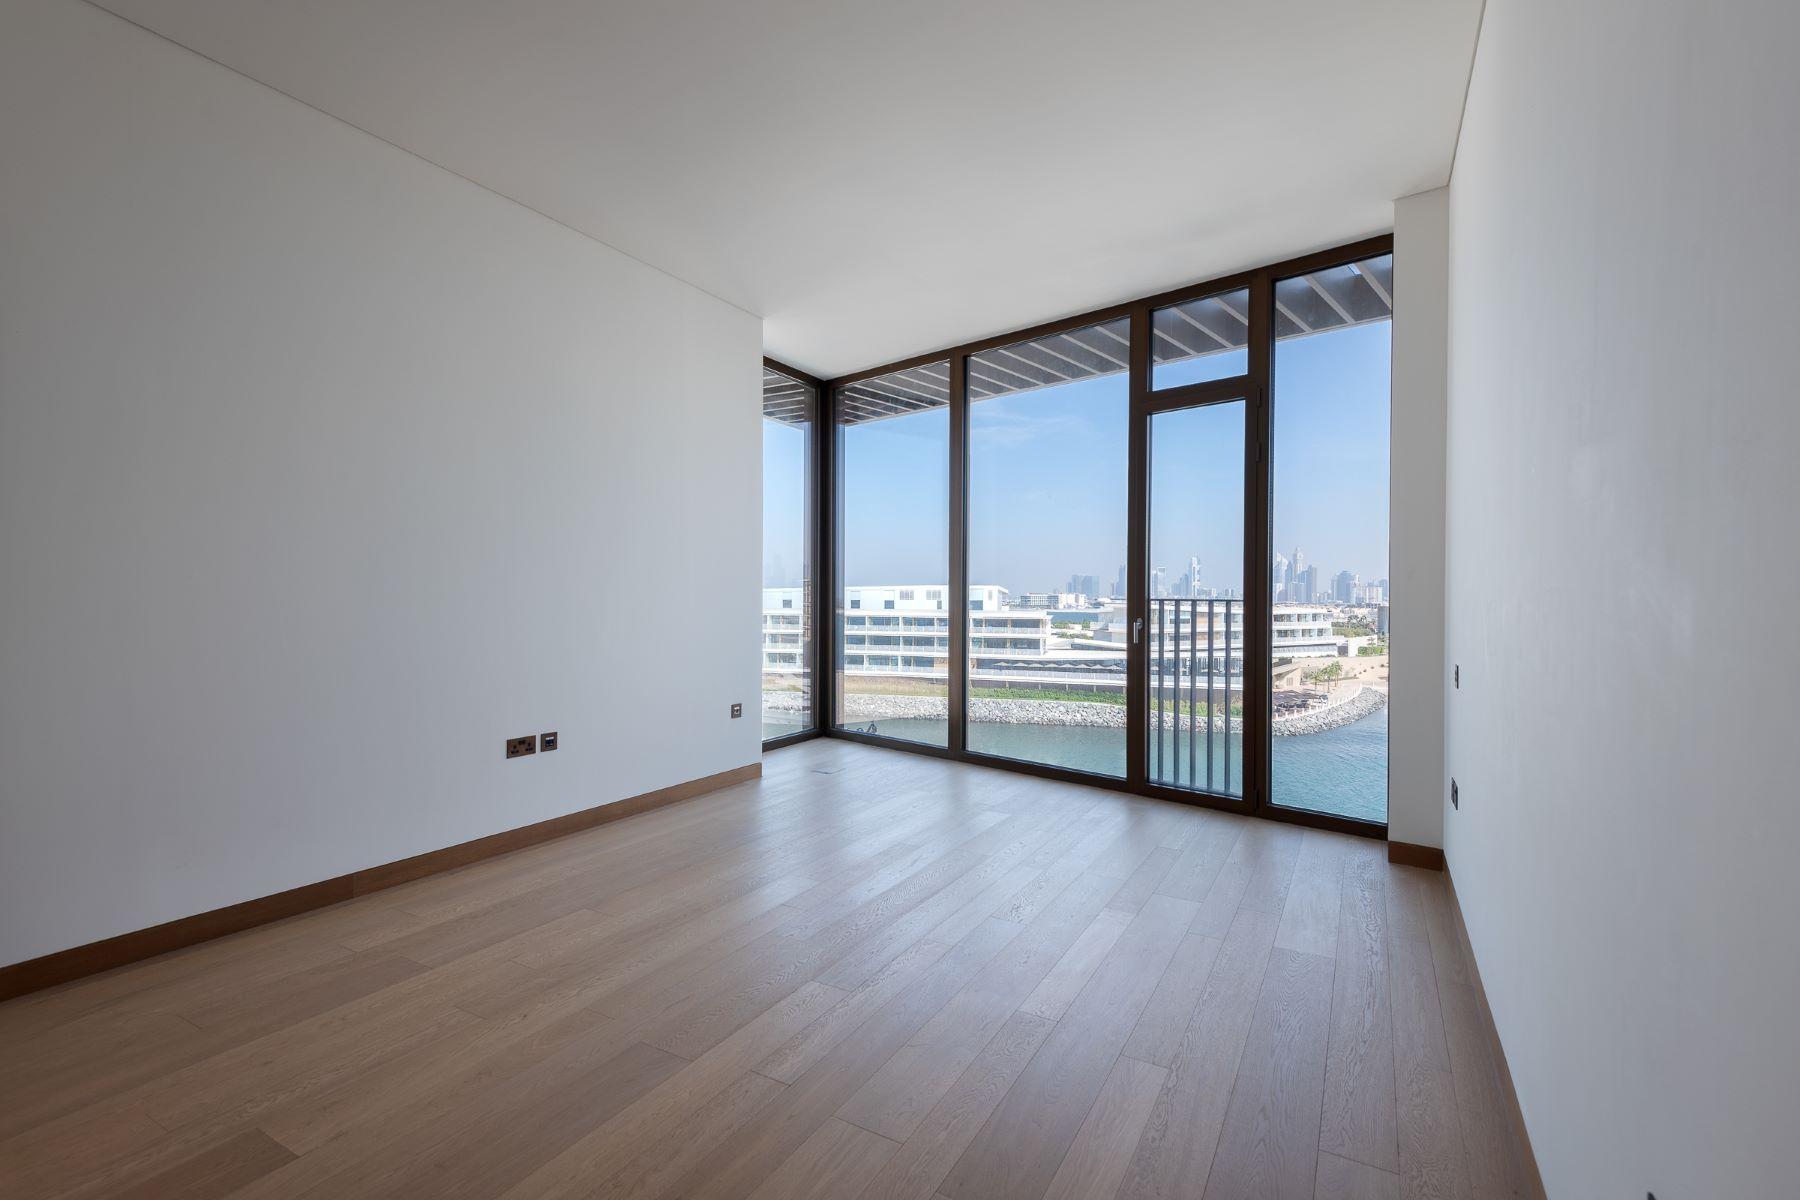 Apartments for Sale at Luxury Ready to Move in Bulgari Resort Dubai, Dubai United Arab Emirates